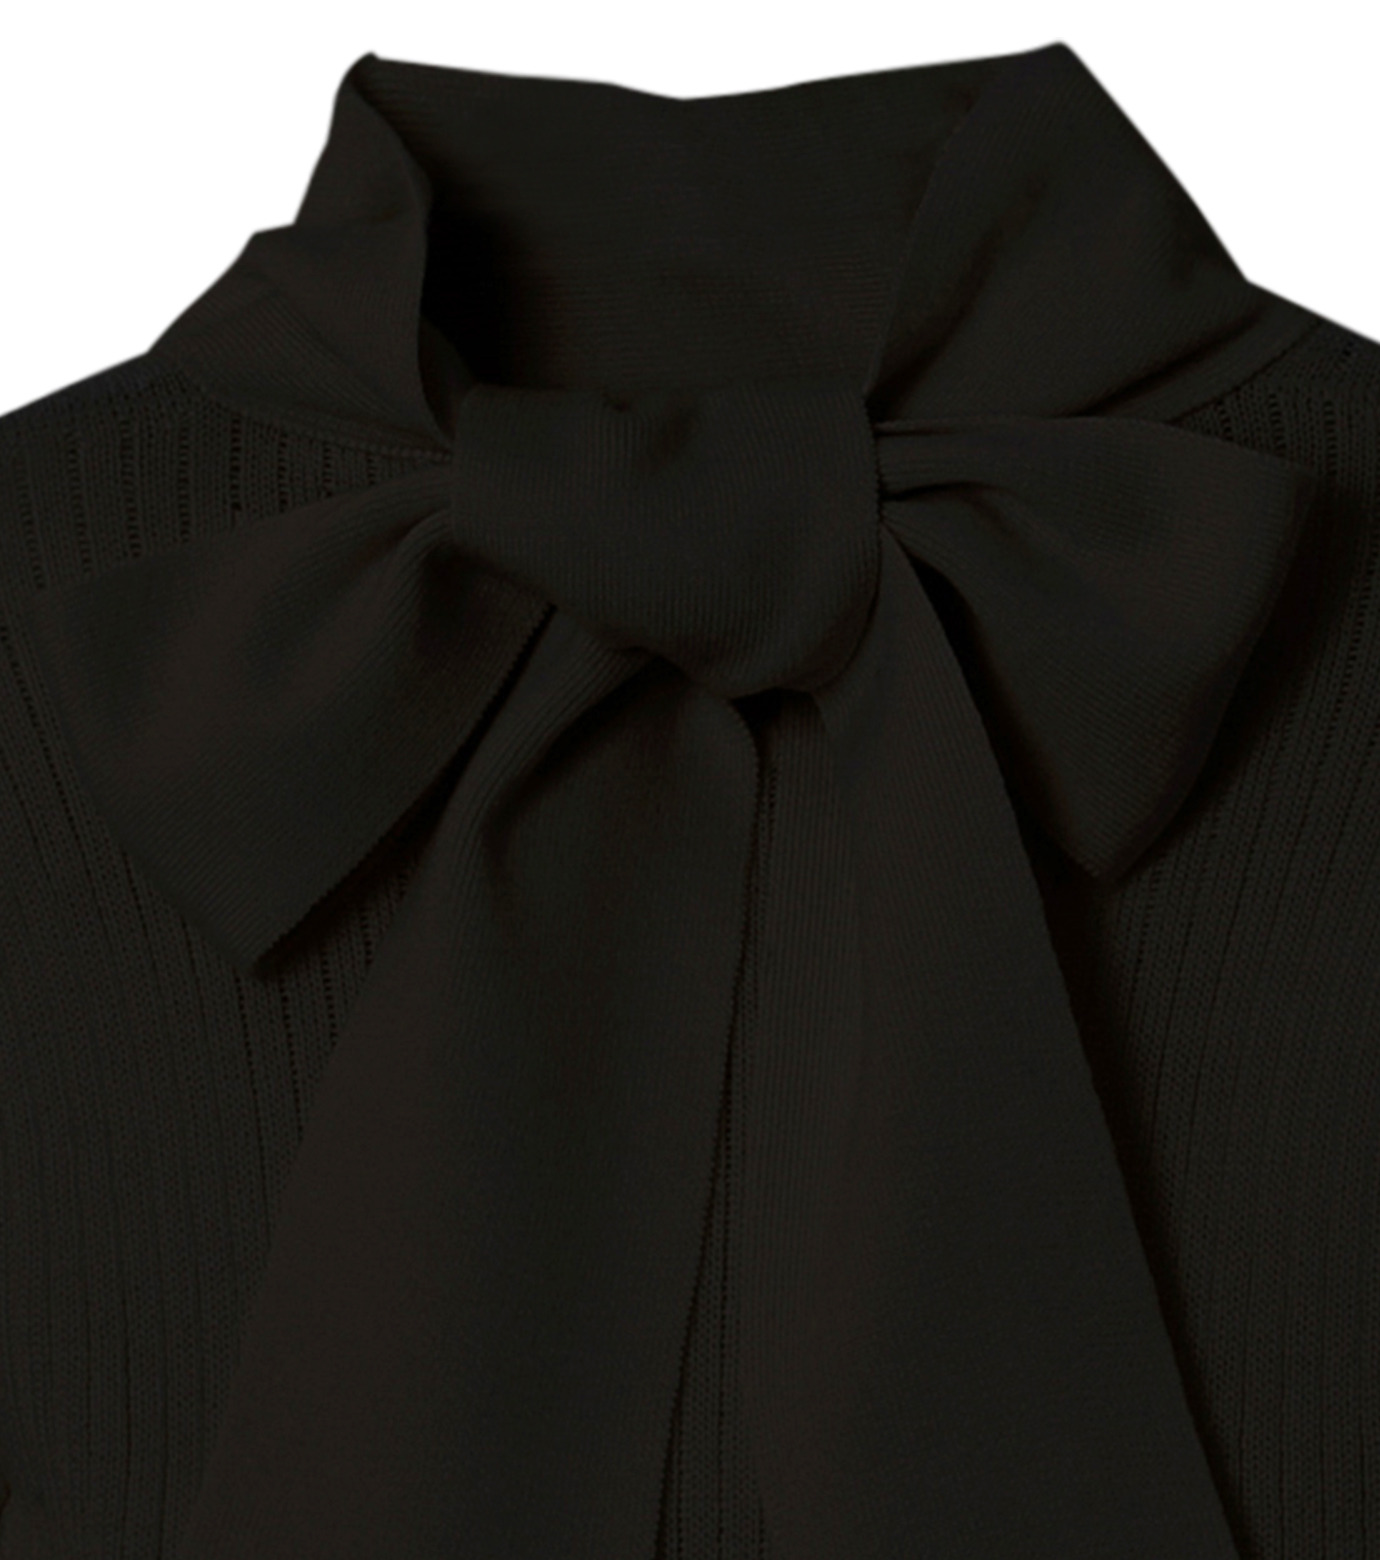 CHRISTIAN DADA(クリスチャン ダダ)のRib Turtleneck Bowtie Detail-BLACK(ニット/knit)-16W-D-0811-13 拡大詳細画像3